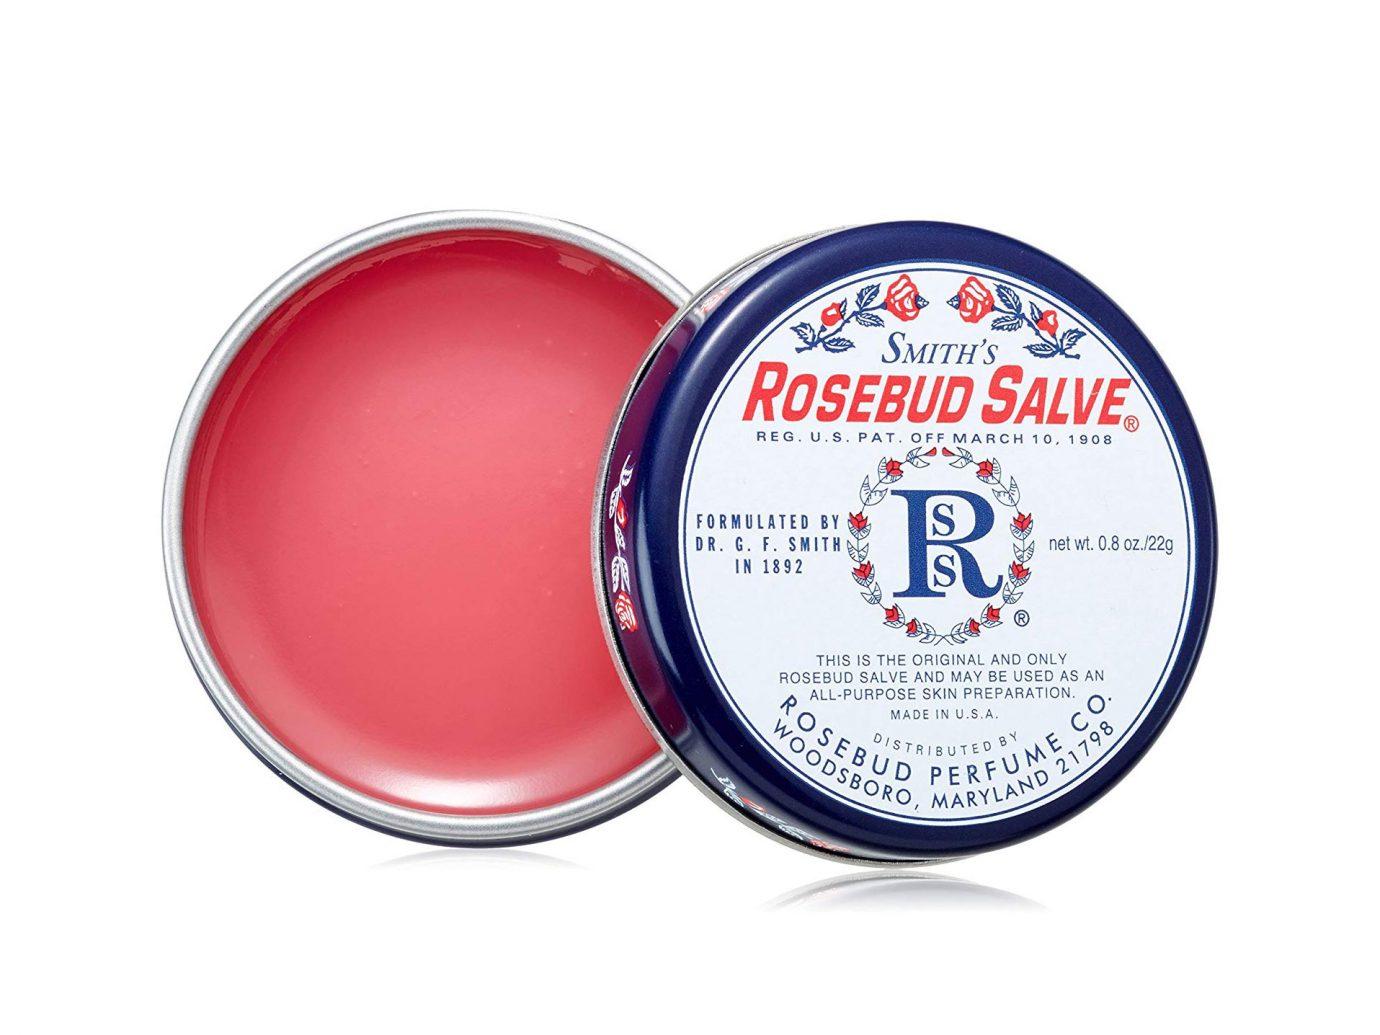 Smith's Rosebud Salve Tin